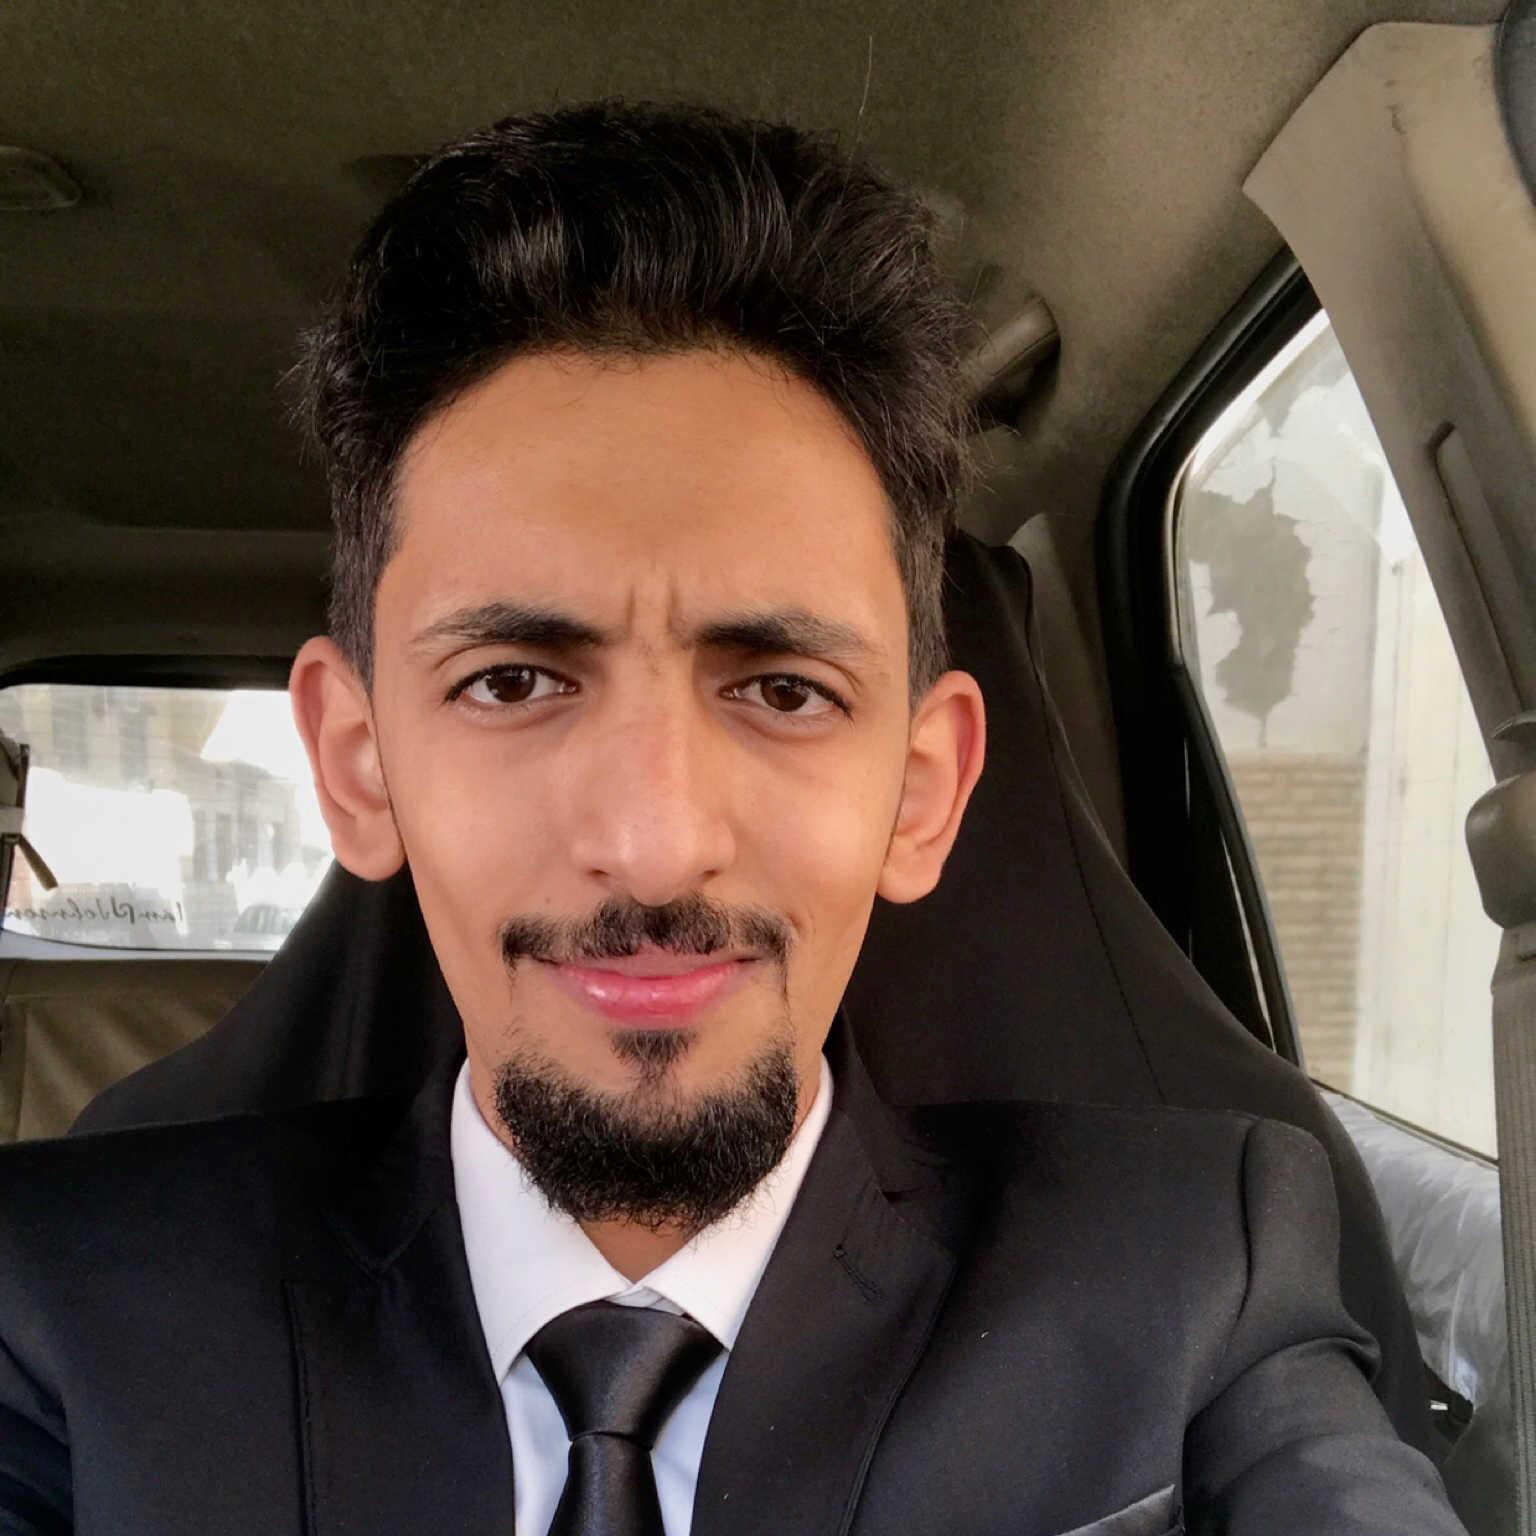 Mohmmed Saleh